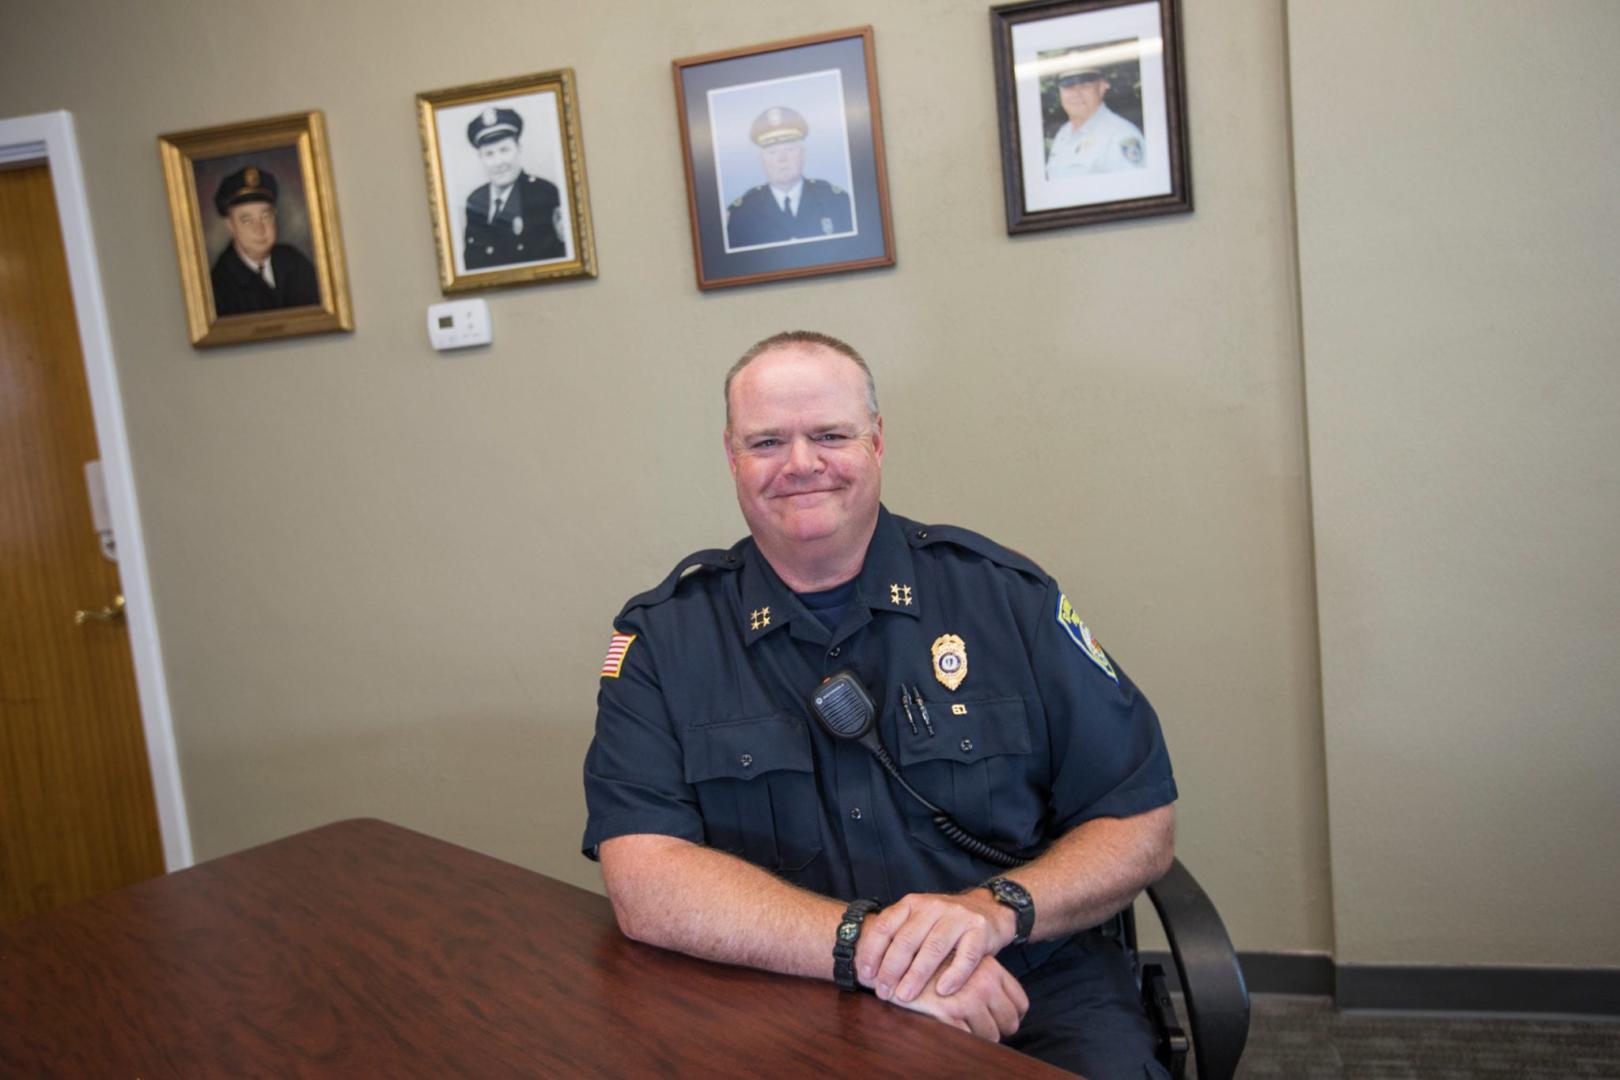 Raynham Police Chief James W. Donovan